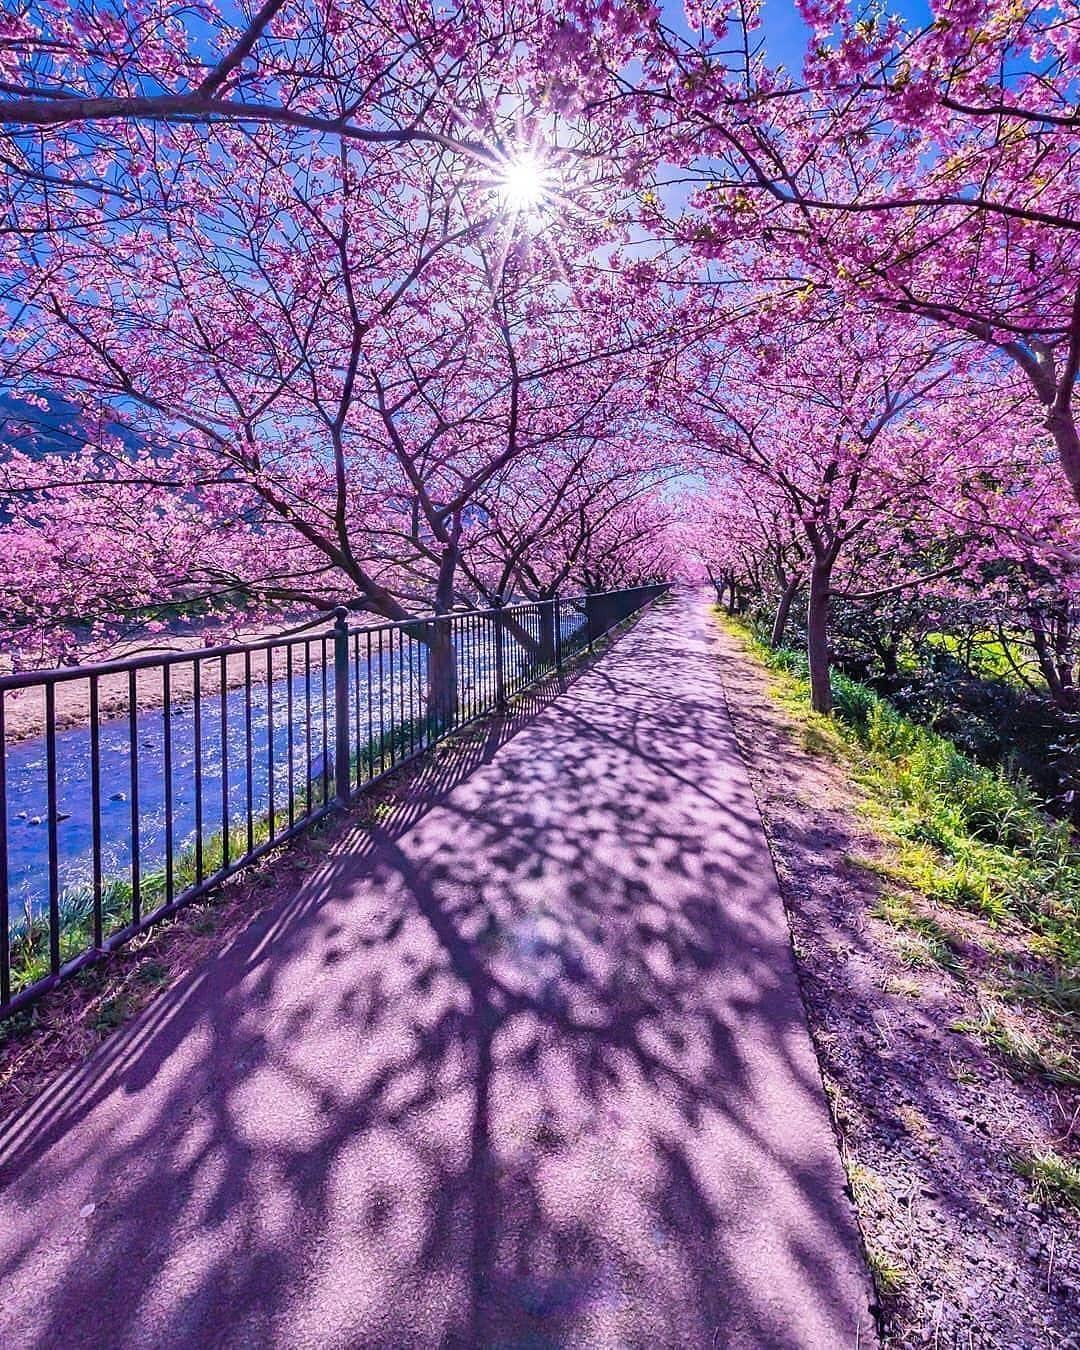 Cherry Blossoms Tunnel Kawazu Japan Photo By Cherry Blossoms Tunnel Kawazu Japan Photo By Tsumi Nature Photography Beautiful Nature Path To Heaven